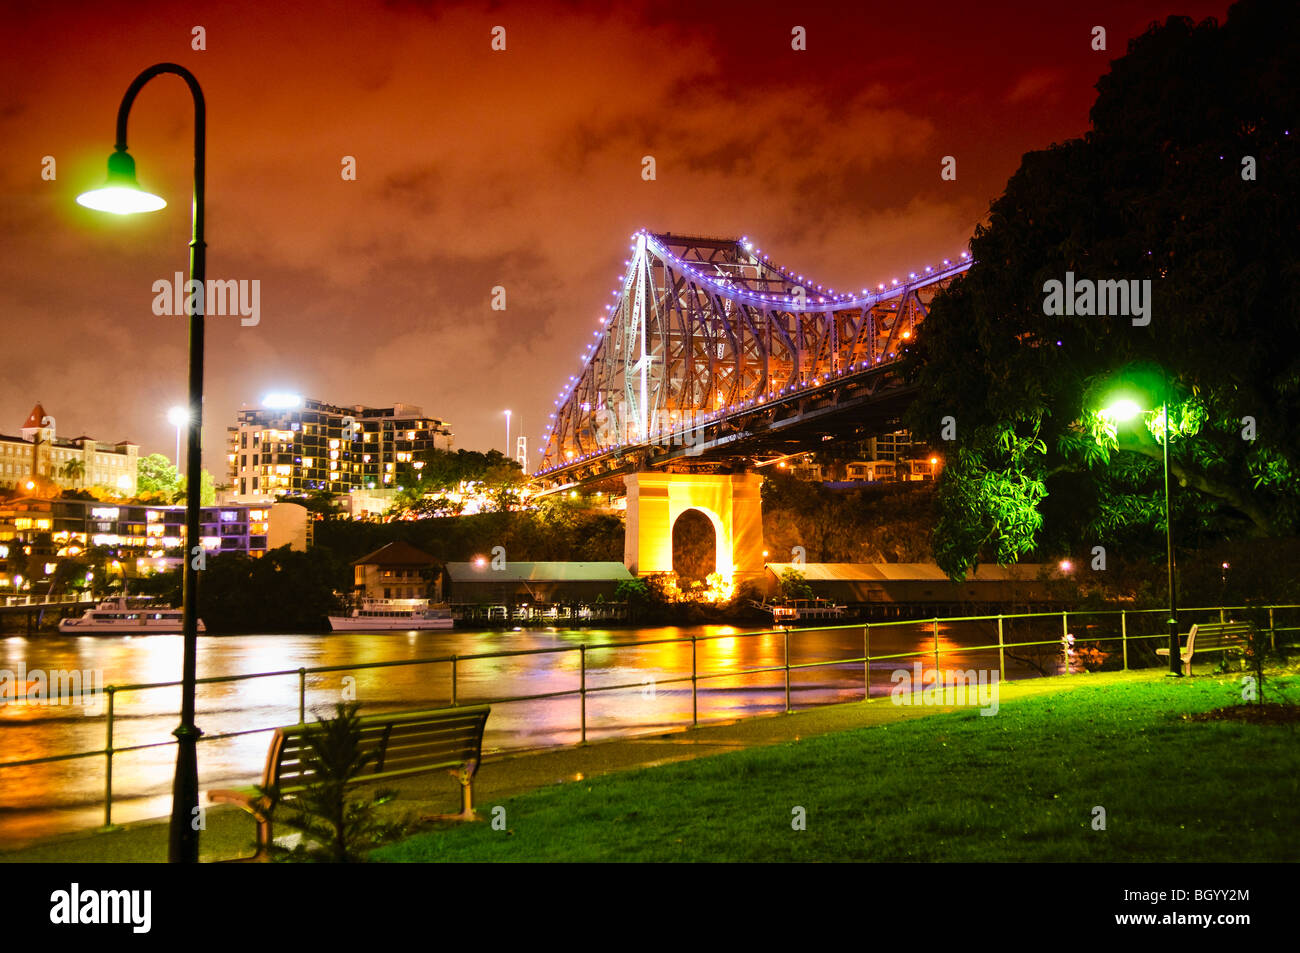 BRISBANE, AUSTRALIE - Brisbane's Story Bridge at night Photo Stock